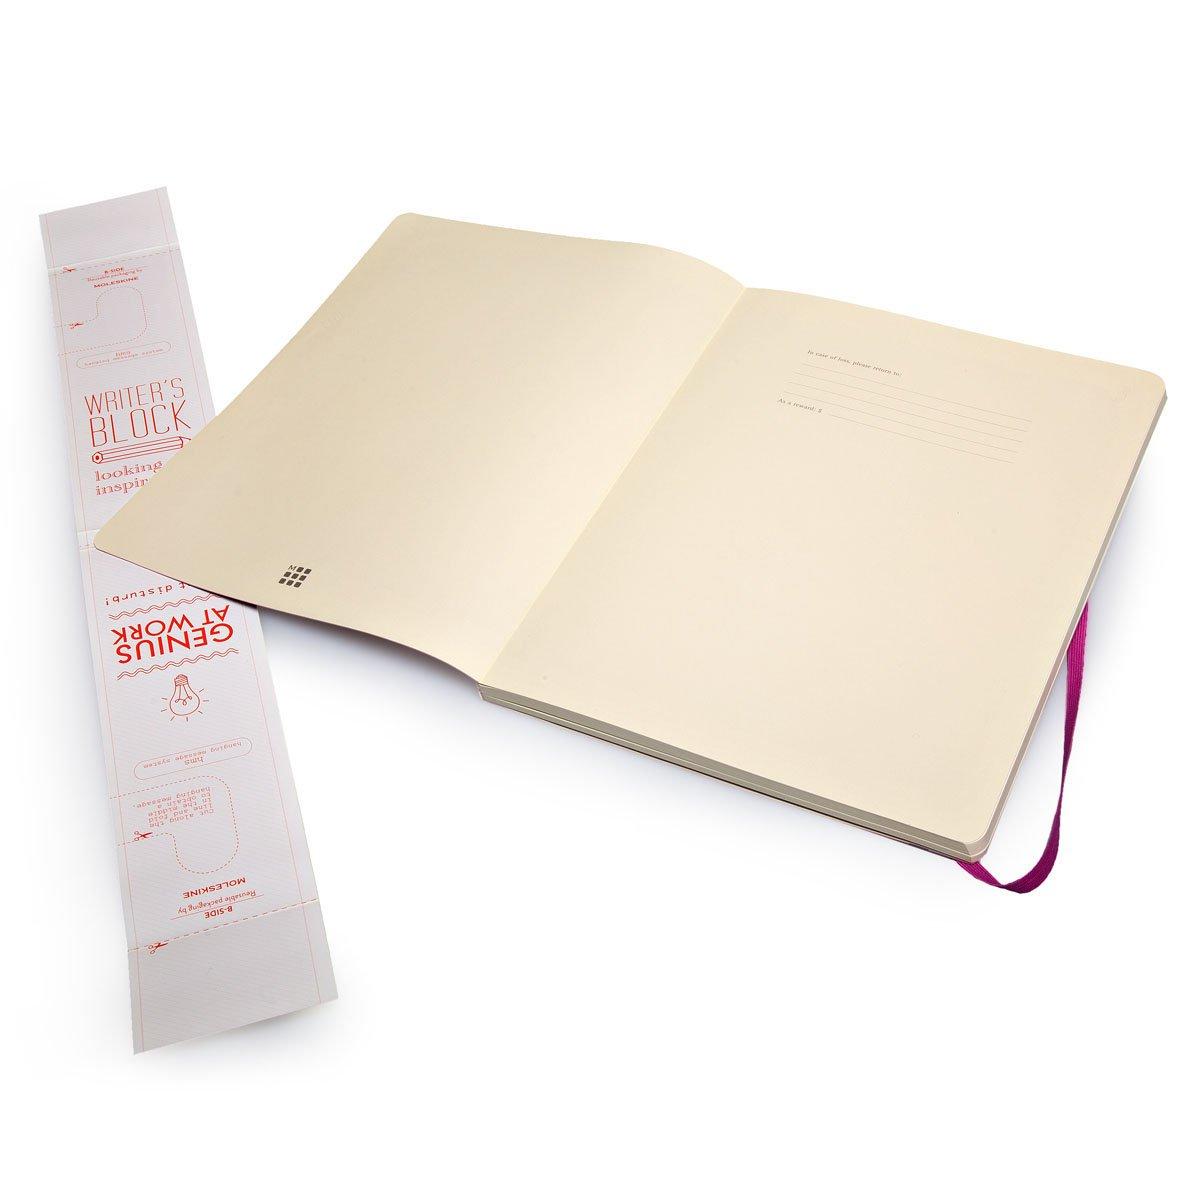 Moleskine Classic Notebook, Soft Cover, XL (7.5'' x 9.5'') Plain/Blank, Orchid Purple